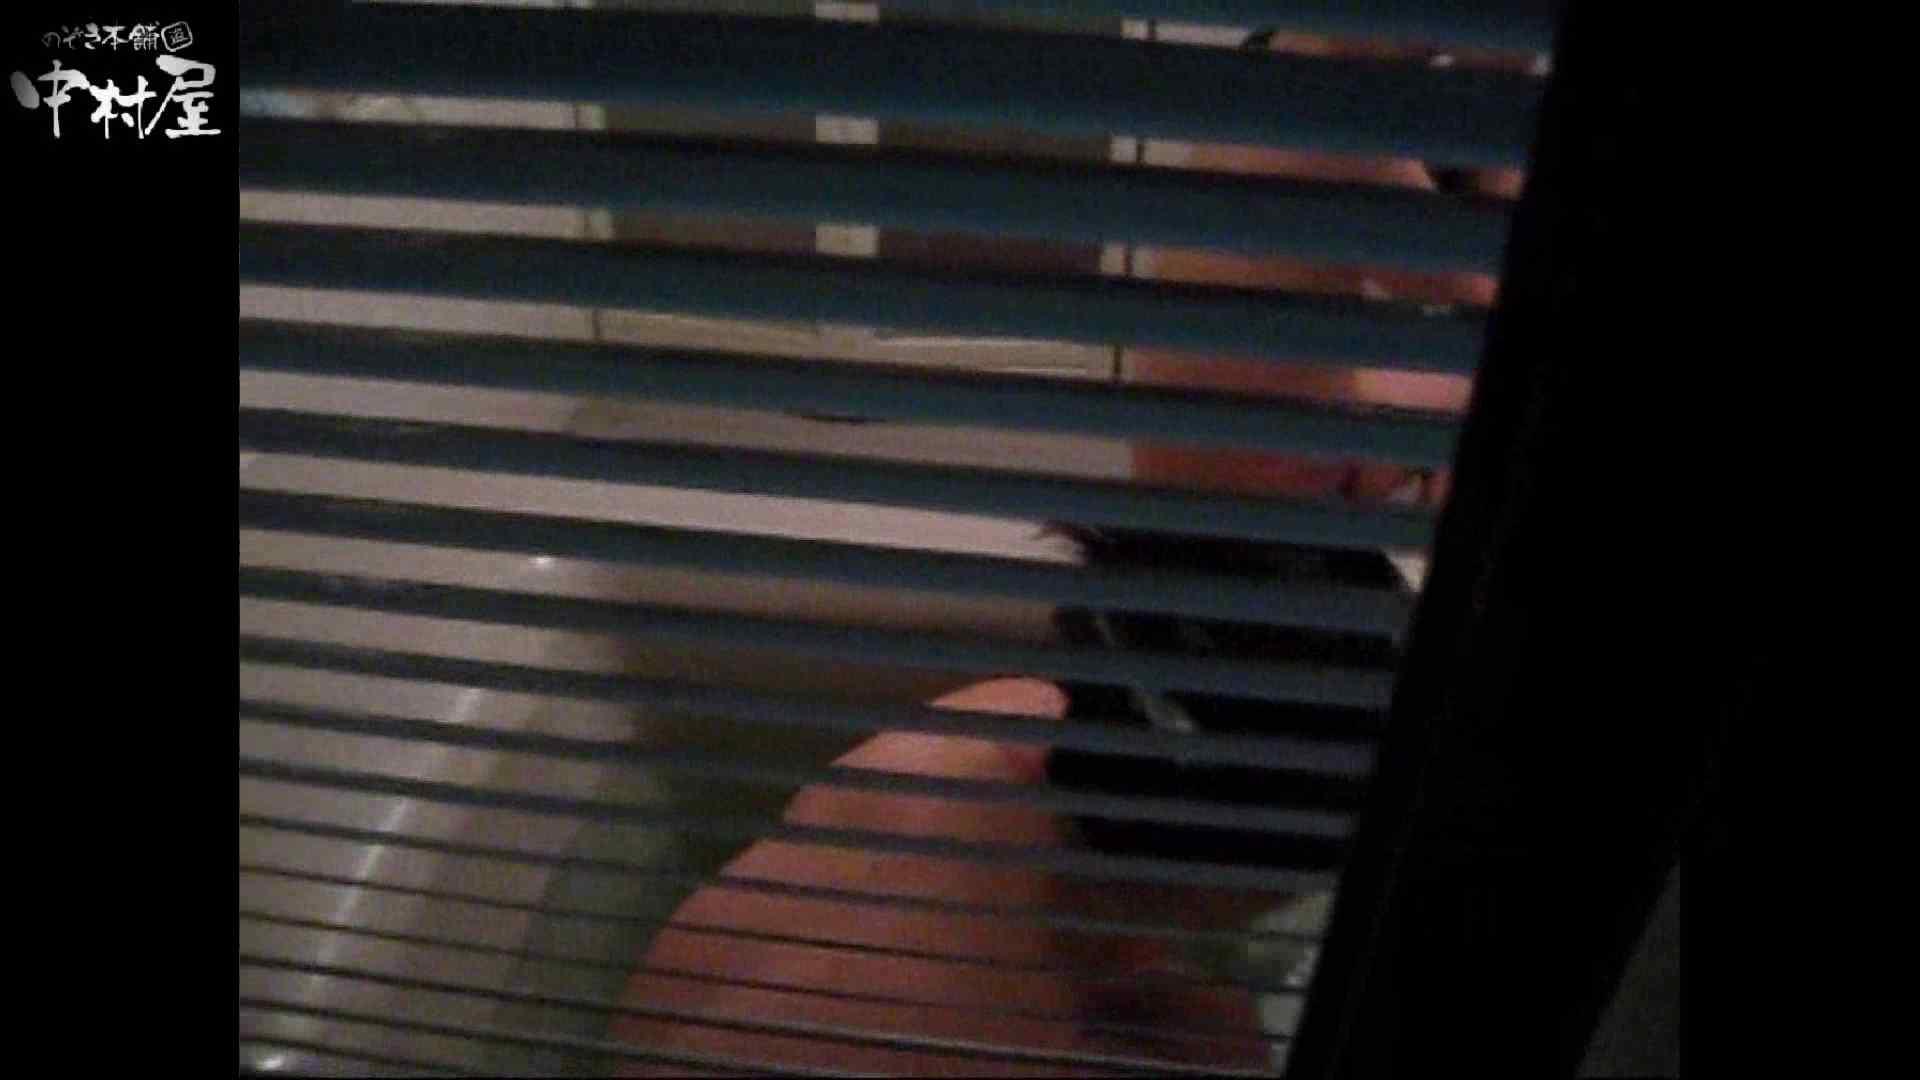 民家風呂専門盗撮師の超危険映像 vol.007 股間 | OLのエロ生活  103連発 49